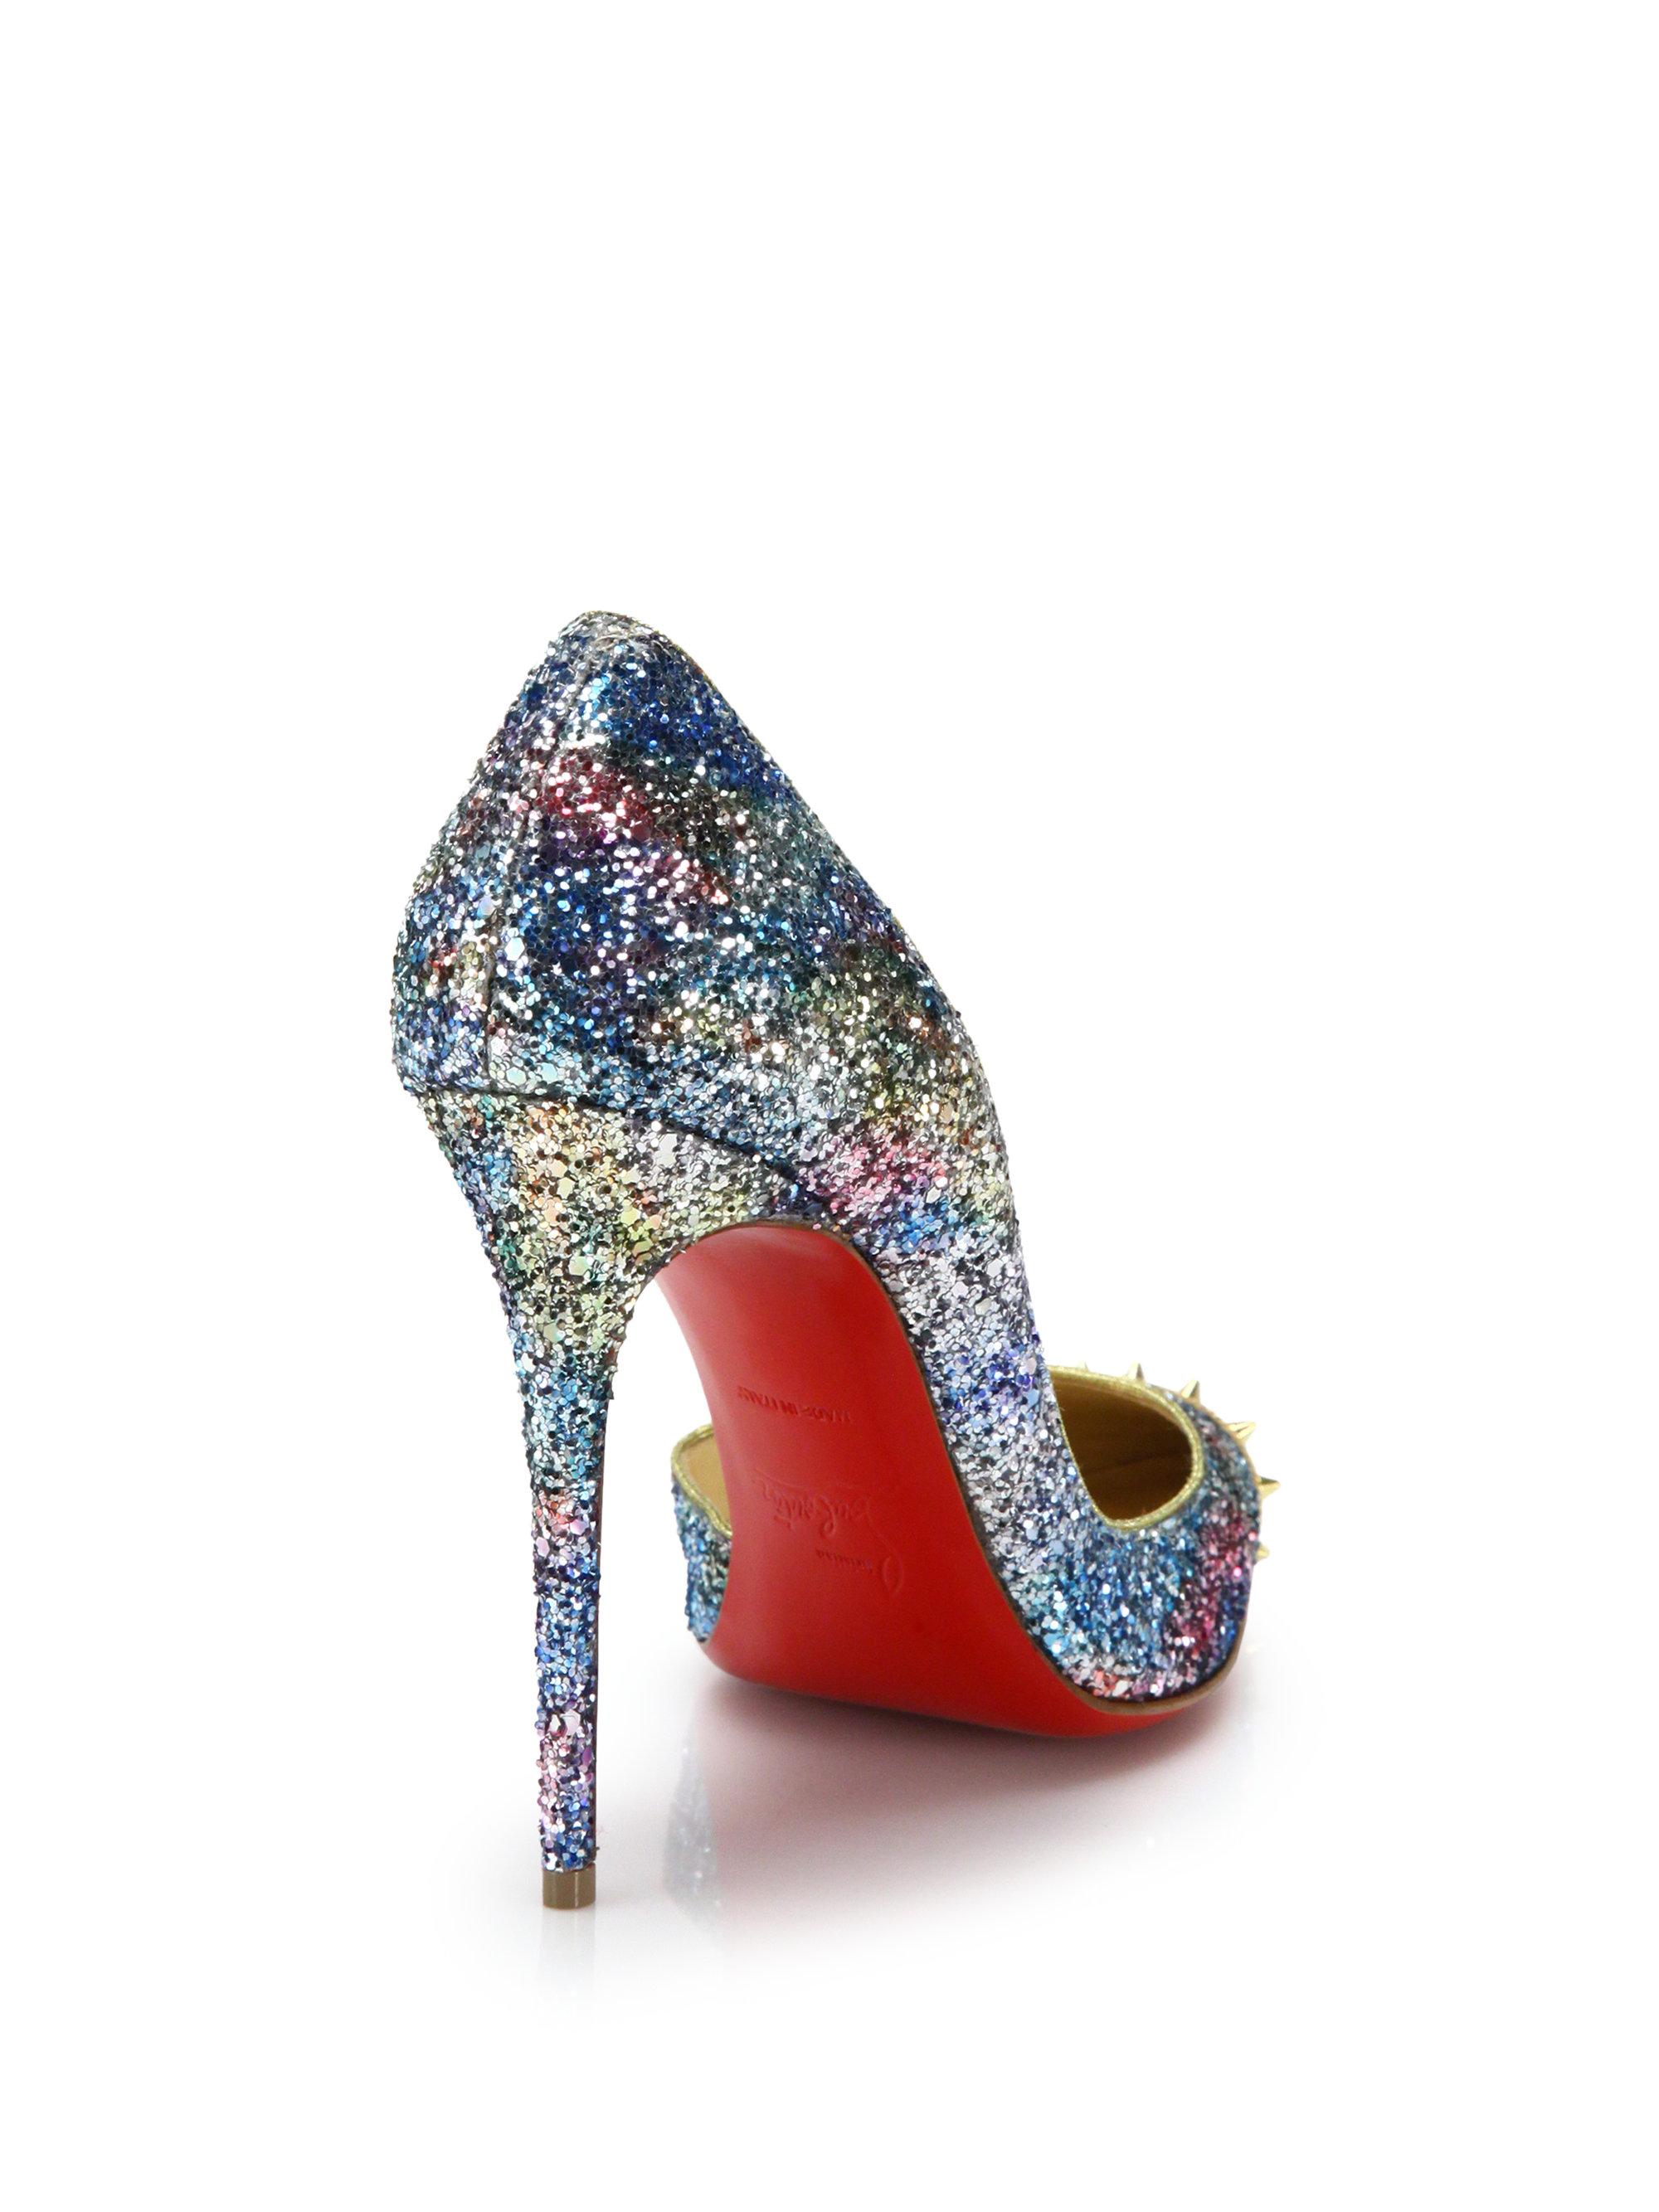 ... replica men shoes - Christian louboutin Leather Glitter D orsay Pumps  in Multicolor .. christian louboutin metallic ... 2494fa22e